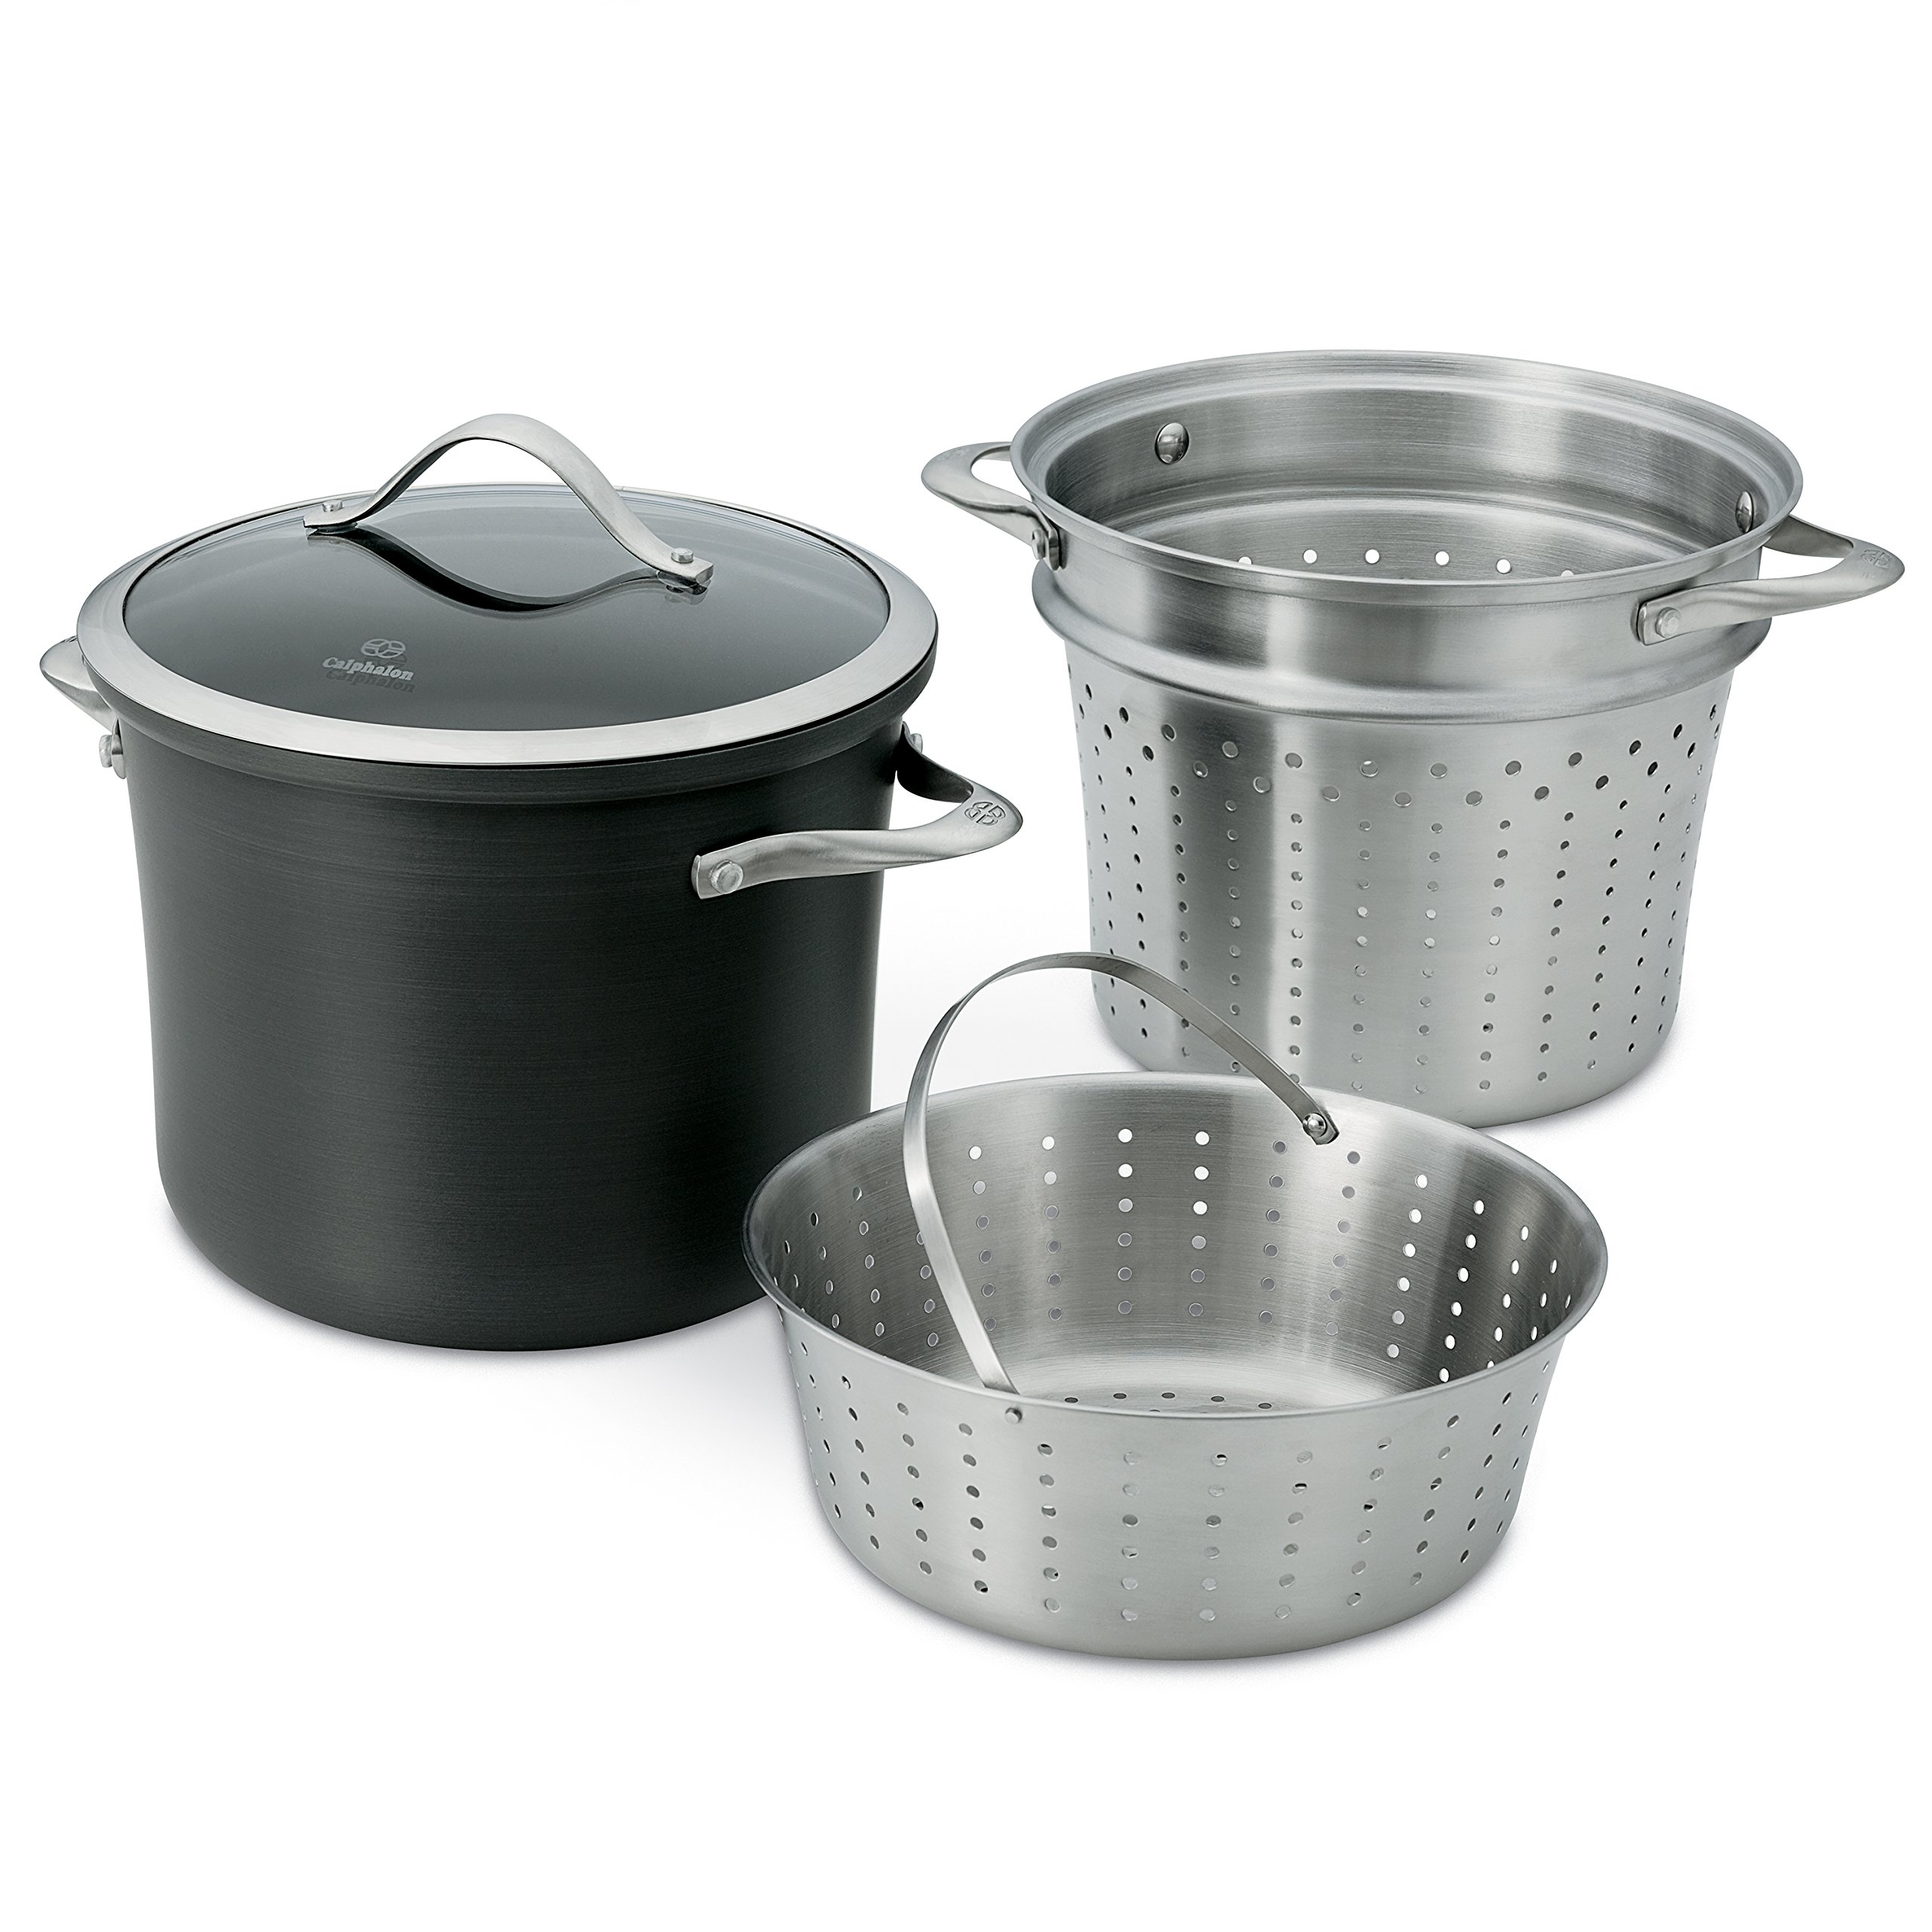 Cheap Pasta Pot Insert Find Pasta Pot Insert Deals On Line At Alibaba Com